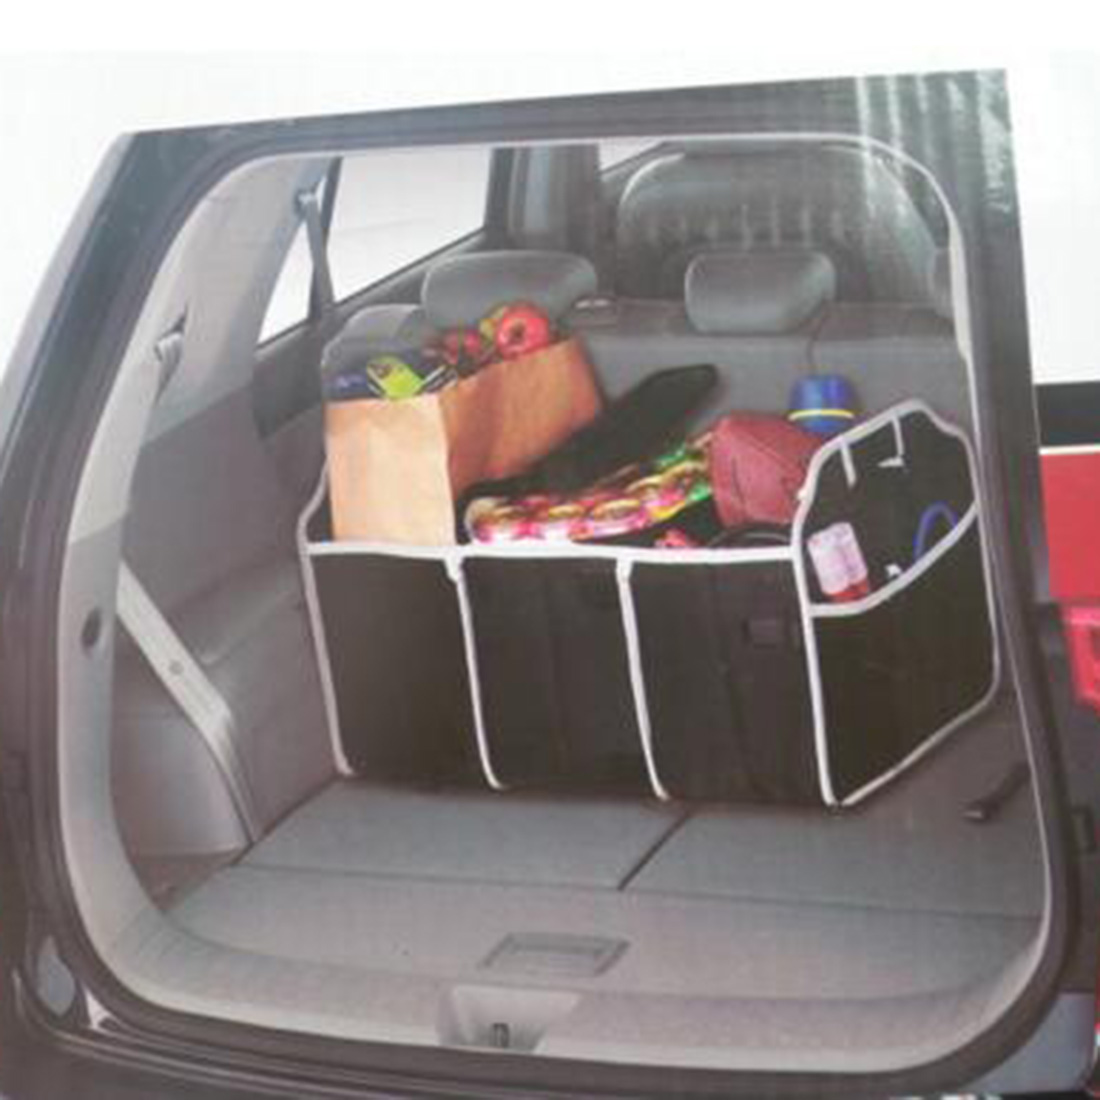 Delicate Auto Non-woven Organizer Speelgoed Voedsel Opslag Container Zakken Doos Auto Styling Auto Opbergen Opruimen Auto Interieur Accessoires